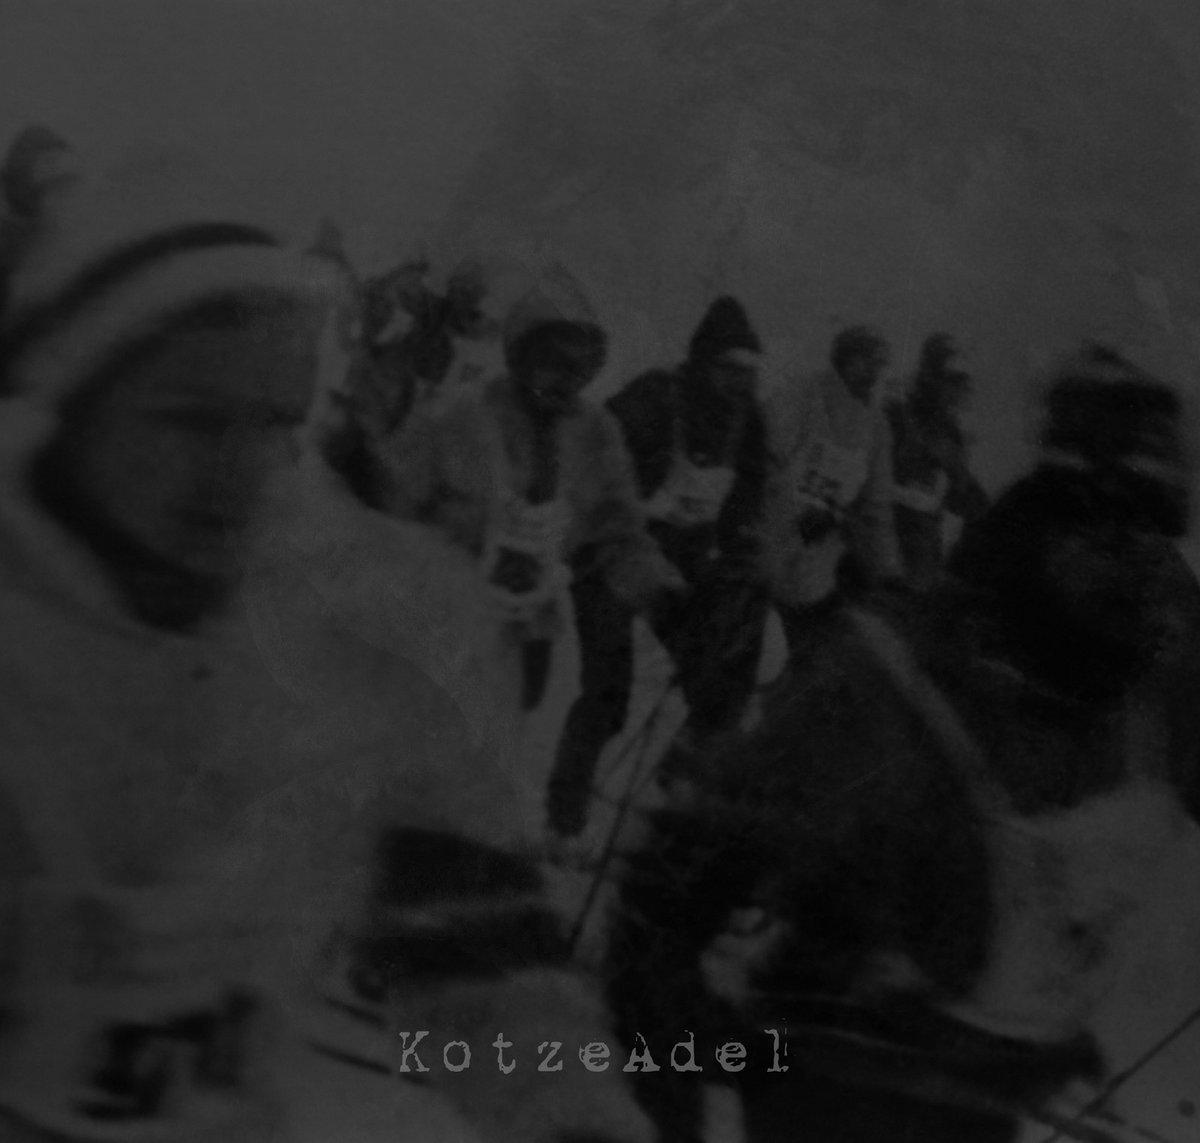 Animo Aeger – KotzeAdel 4/6